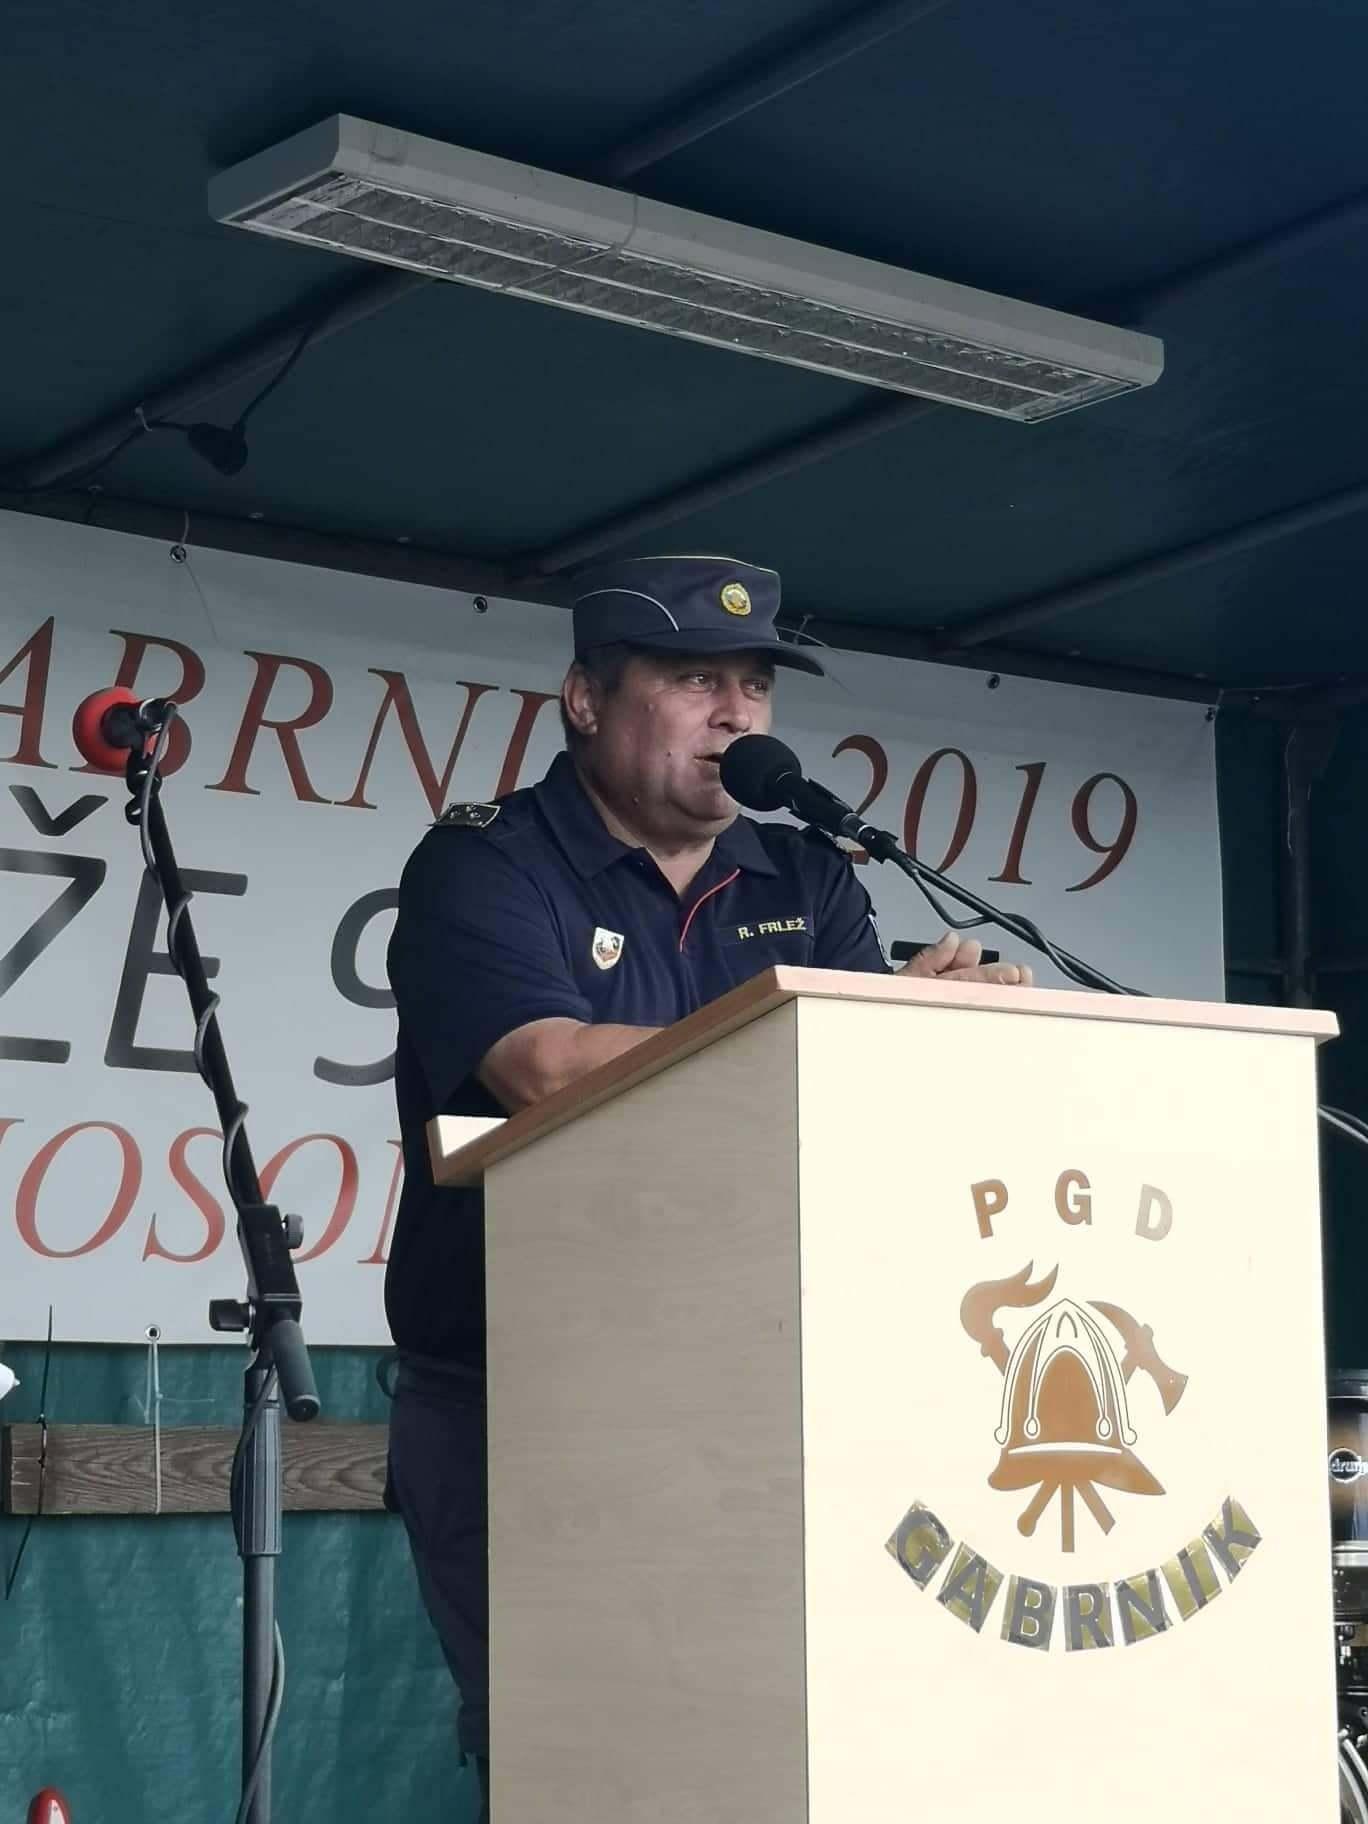 Roman FRLEŽ poveljnik PGD Gabrnik